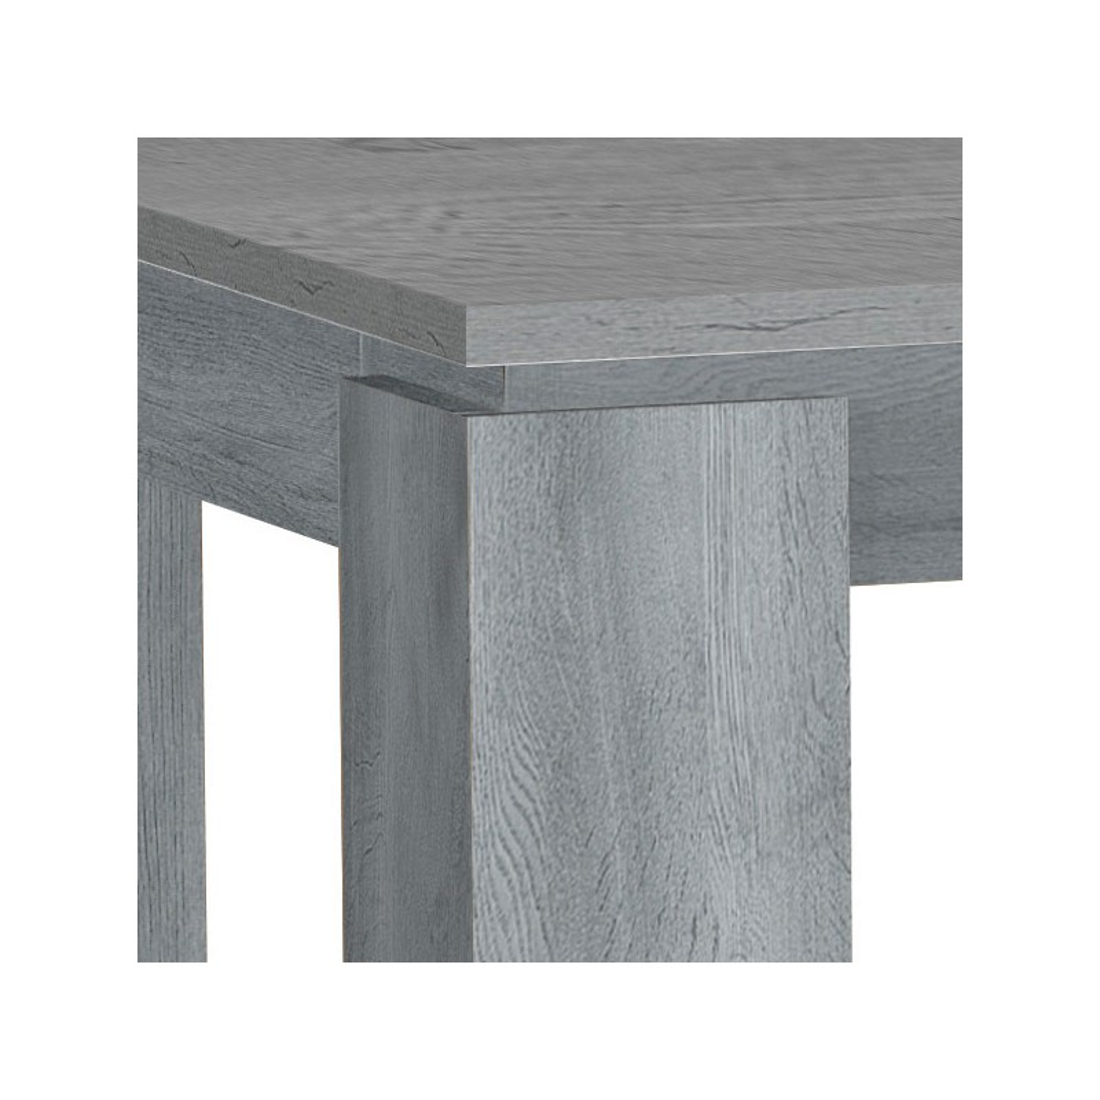 Table salle a manger bois gris table salle a manger bois for Table salle a manger bois gris